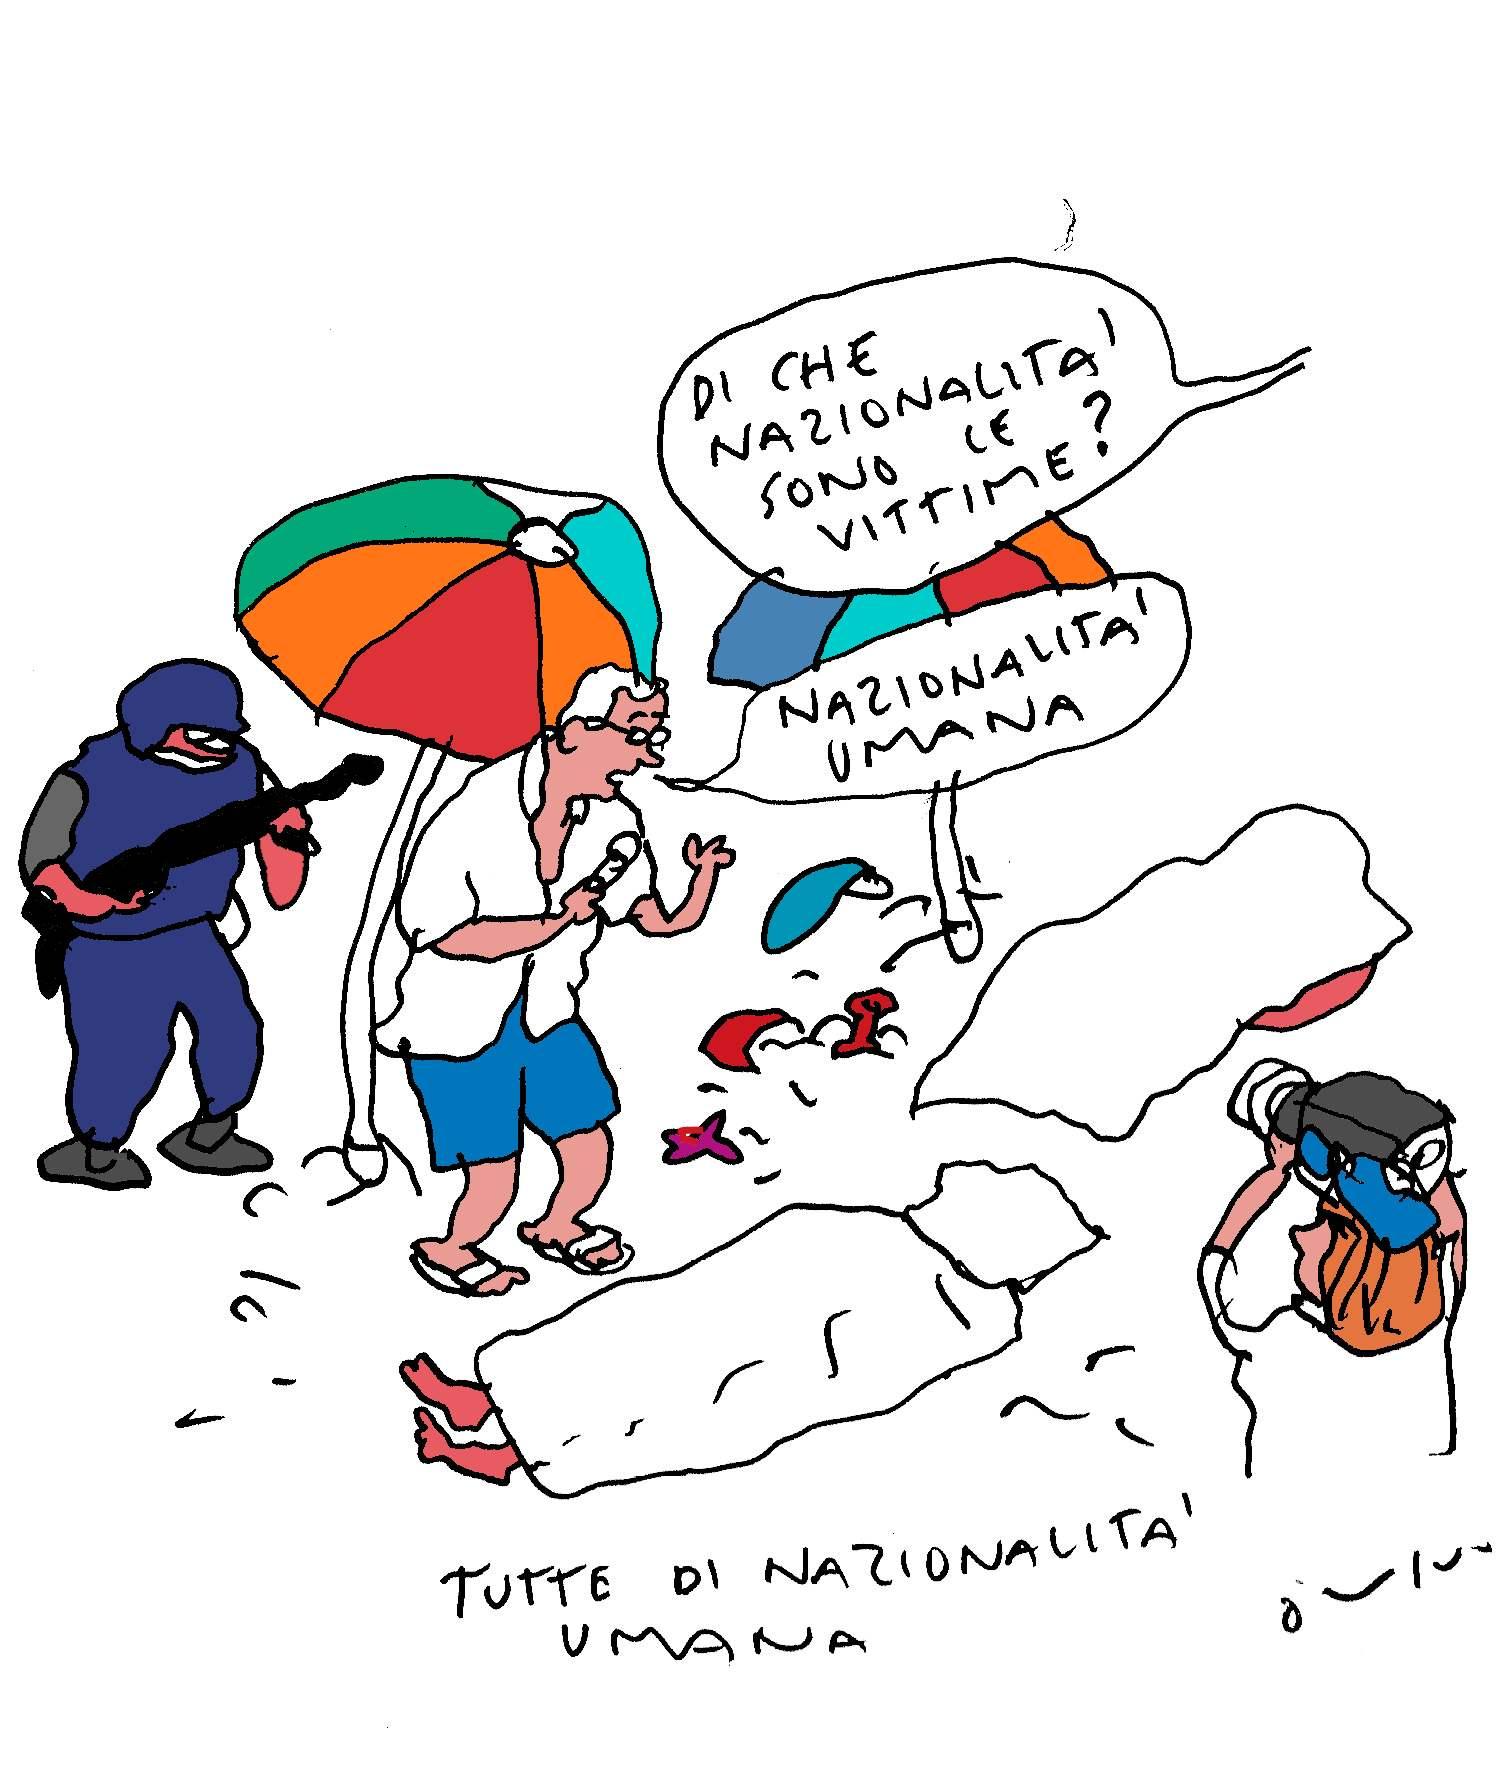 nazionalità vittimek